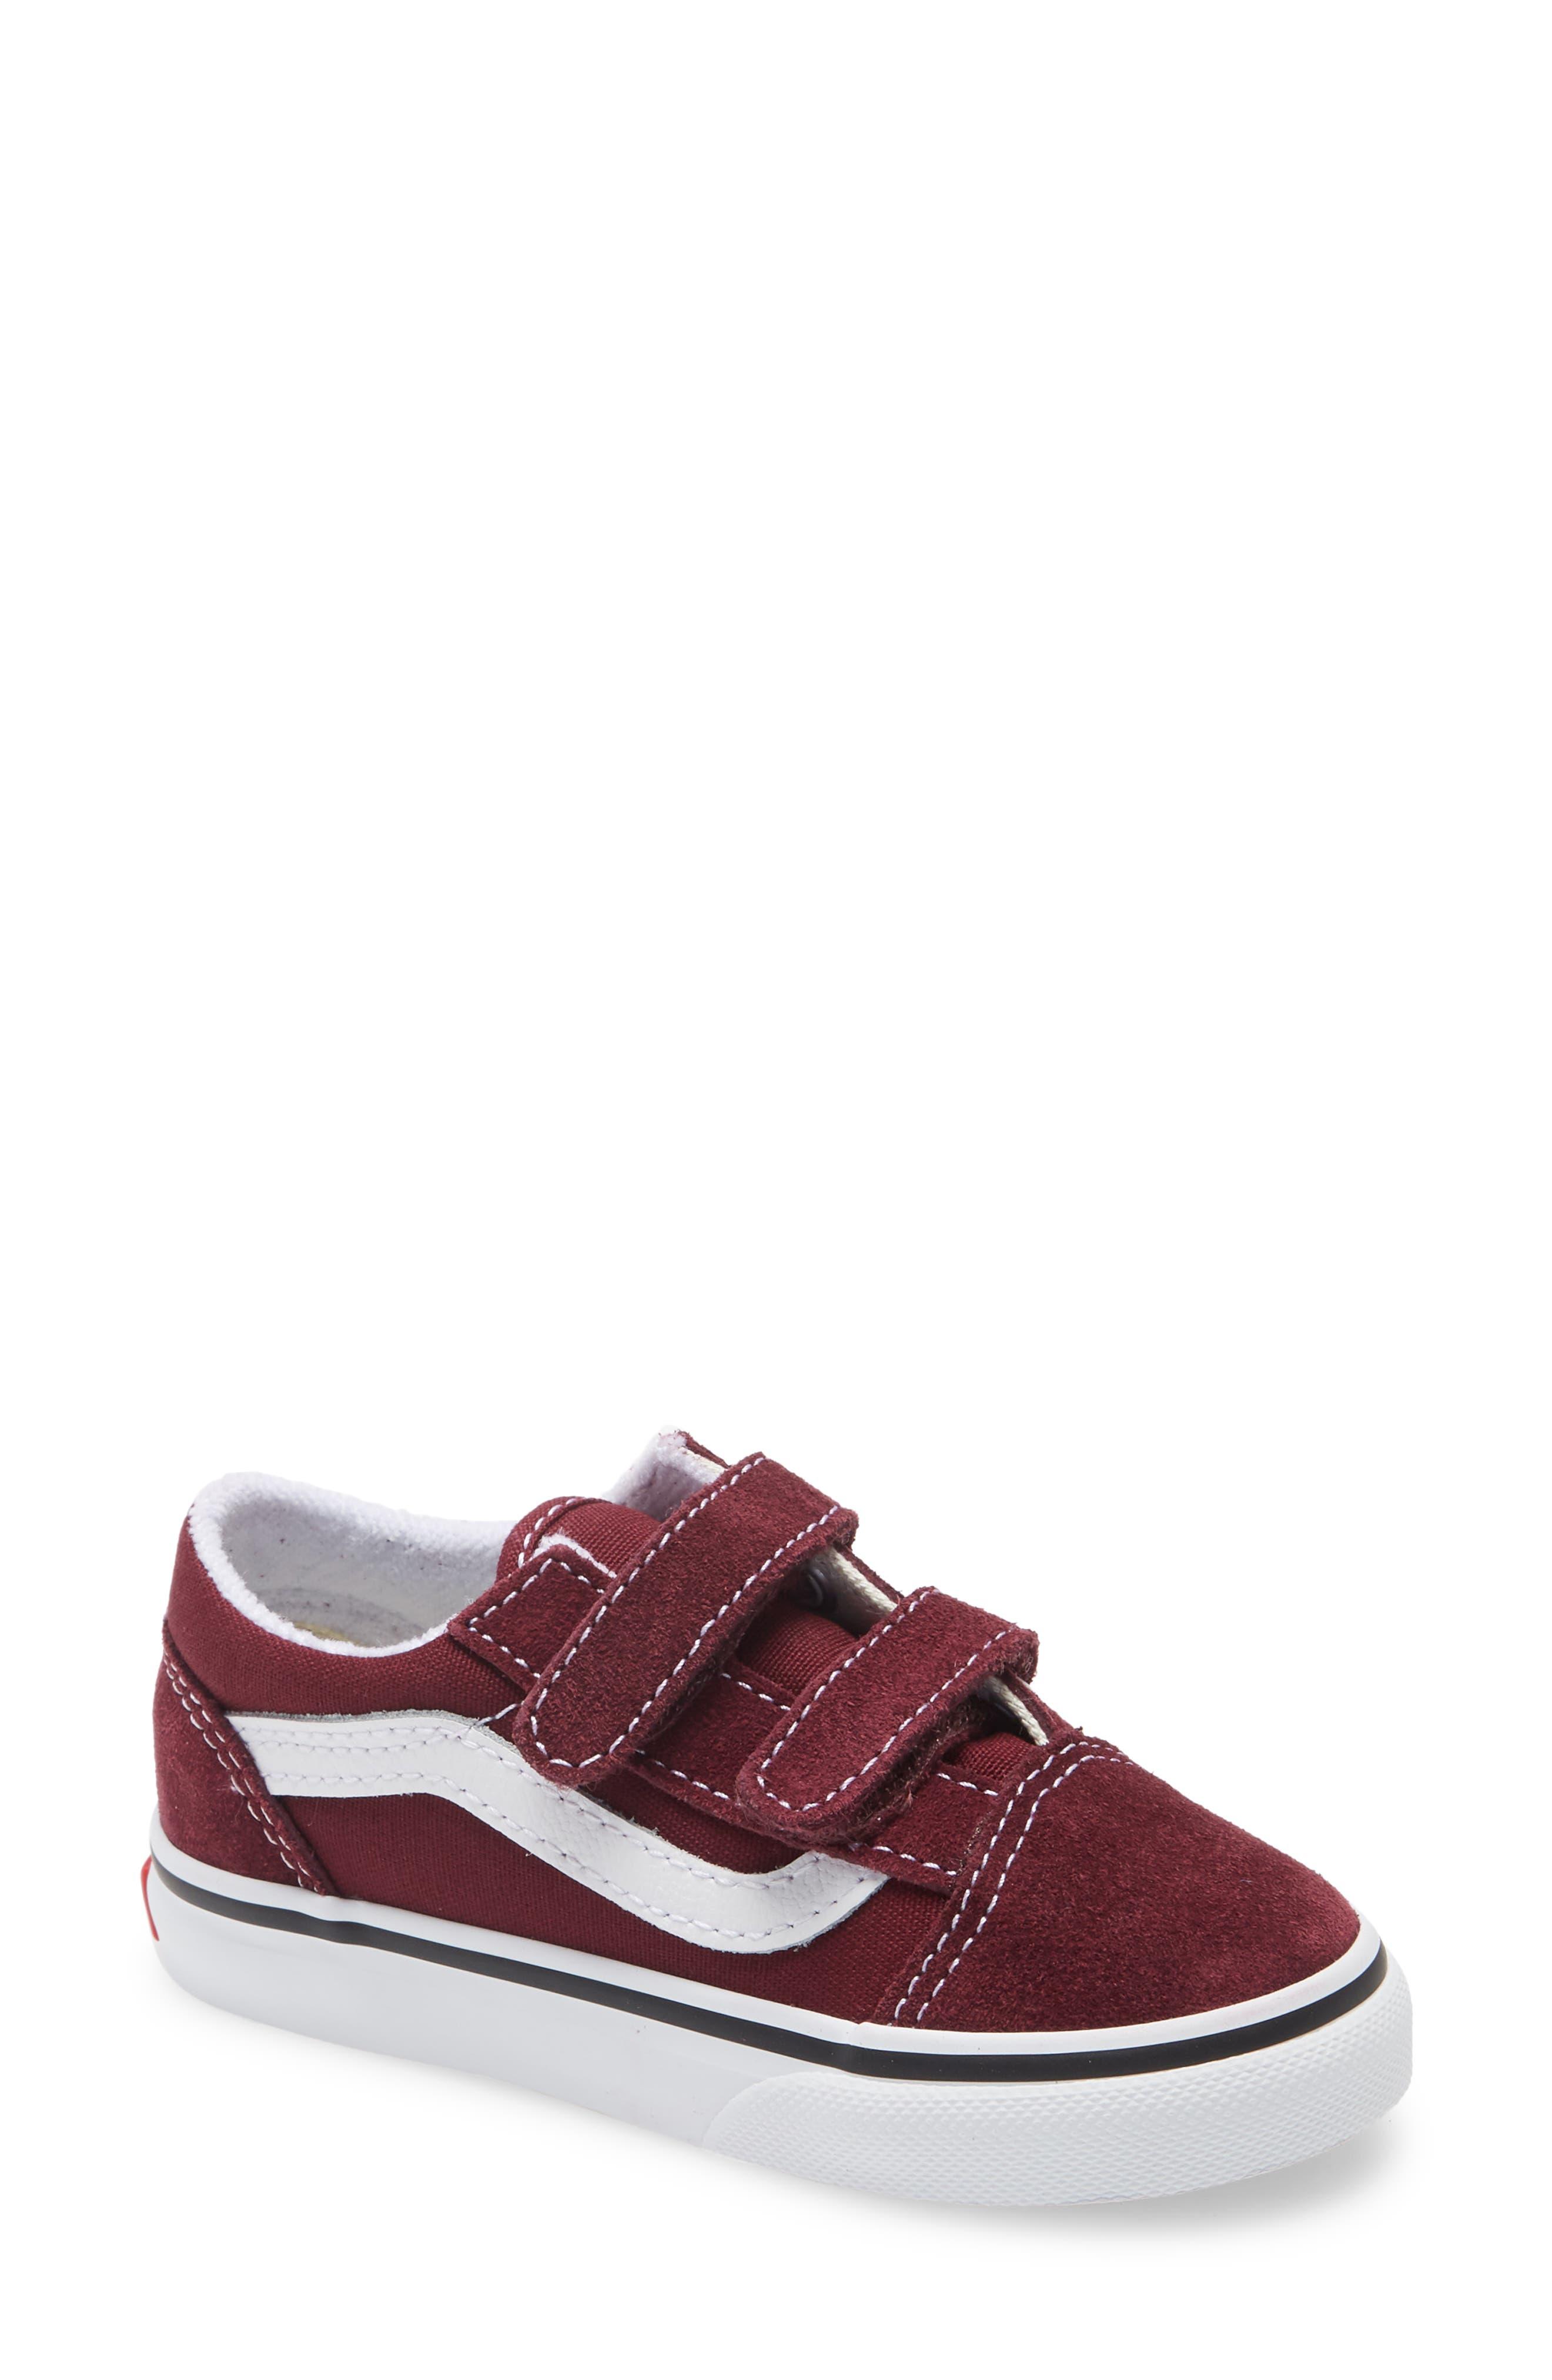 Baby Vans, Walker \u0026 Toddler Shoes